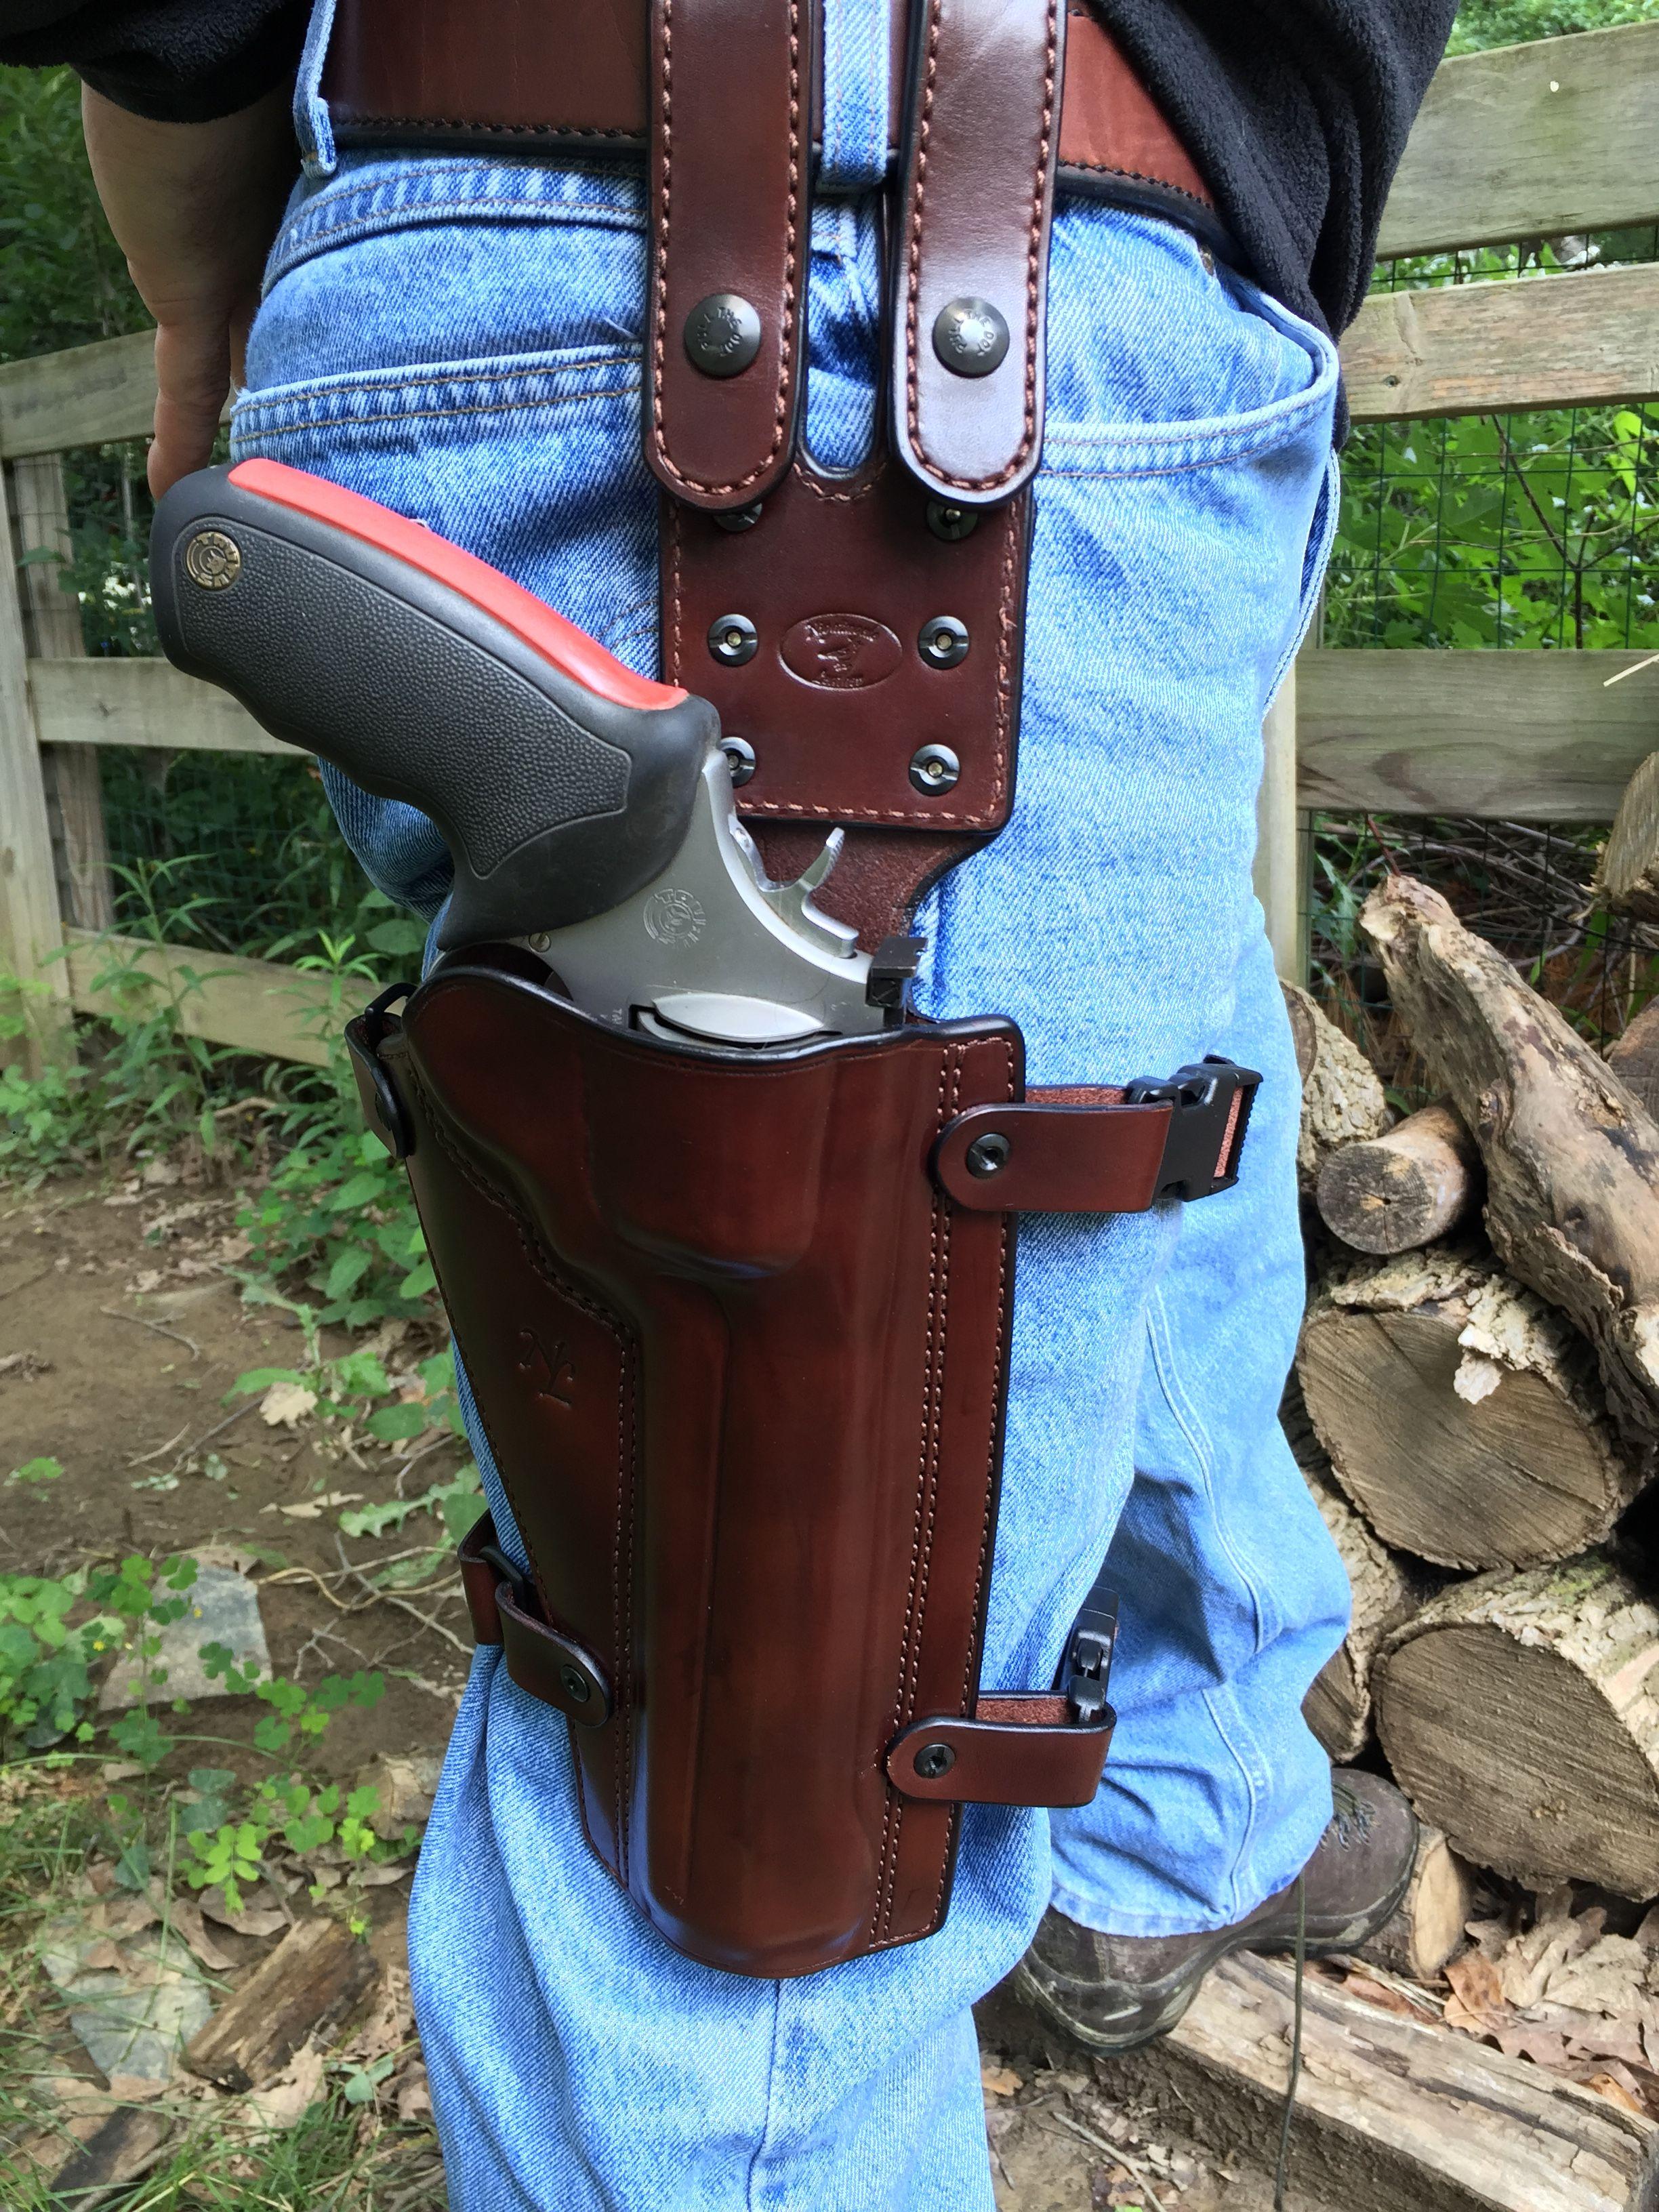 Nightingale Leather Taurus Raging Bull Drop Leg Holster